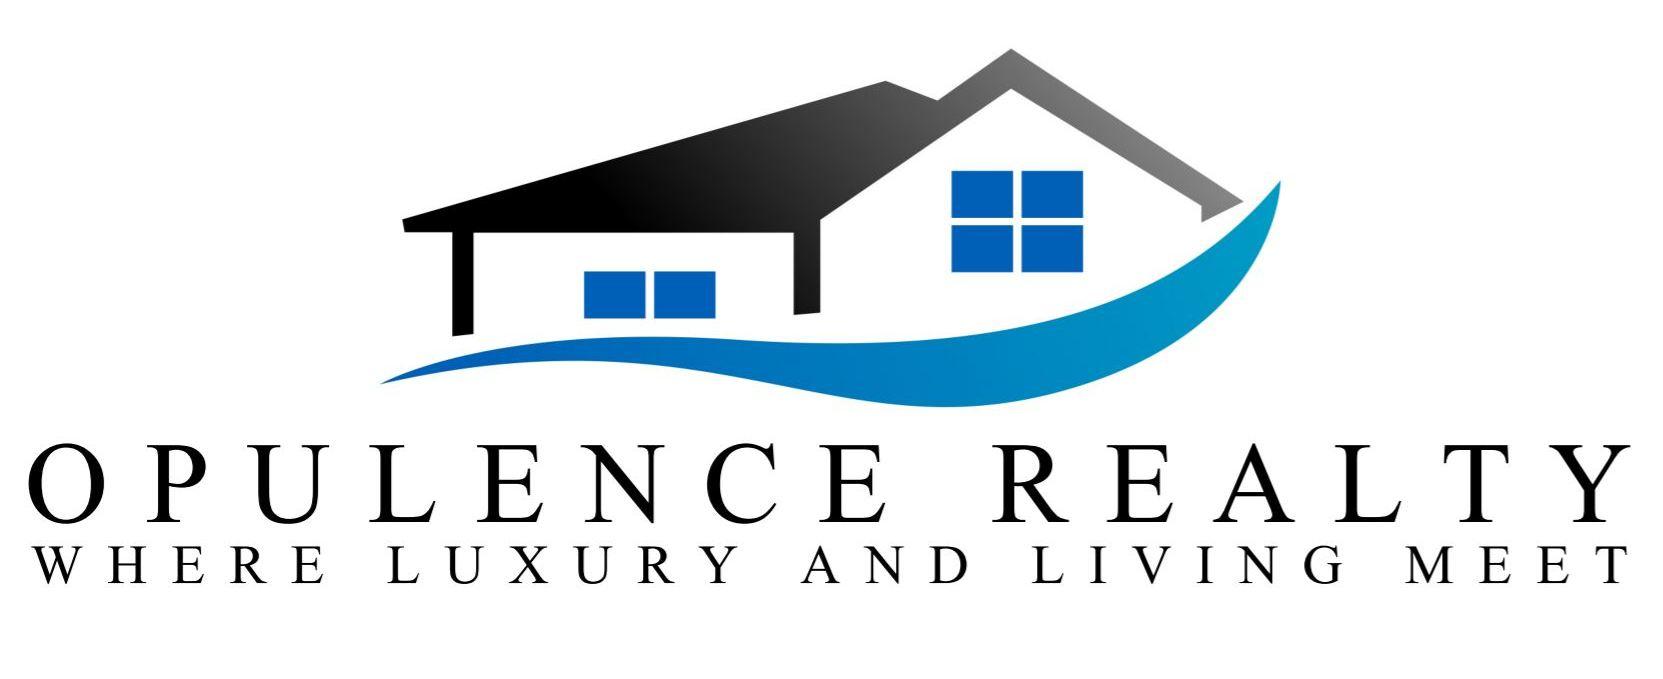 Opulence Realty, LLC